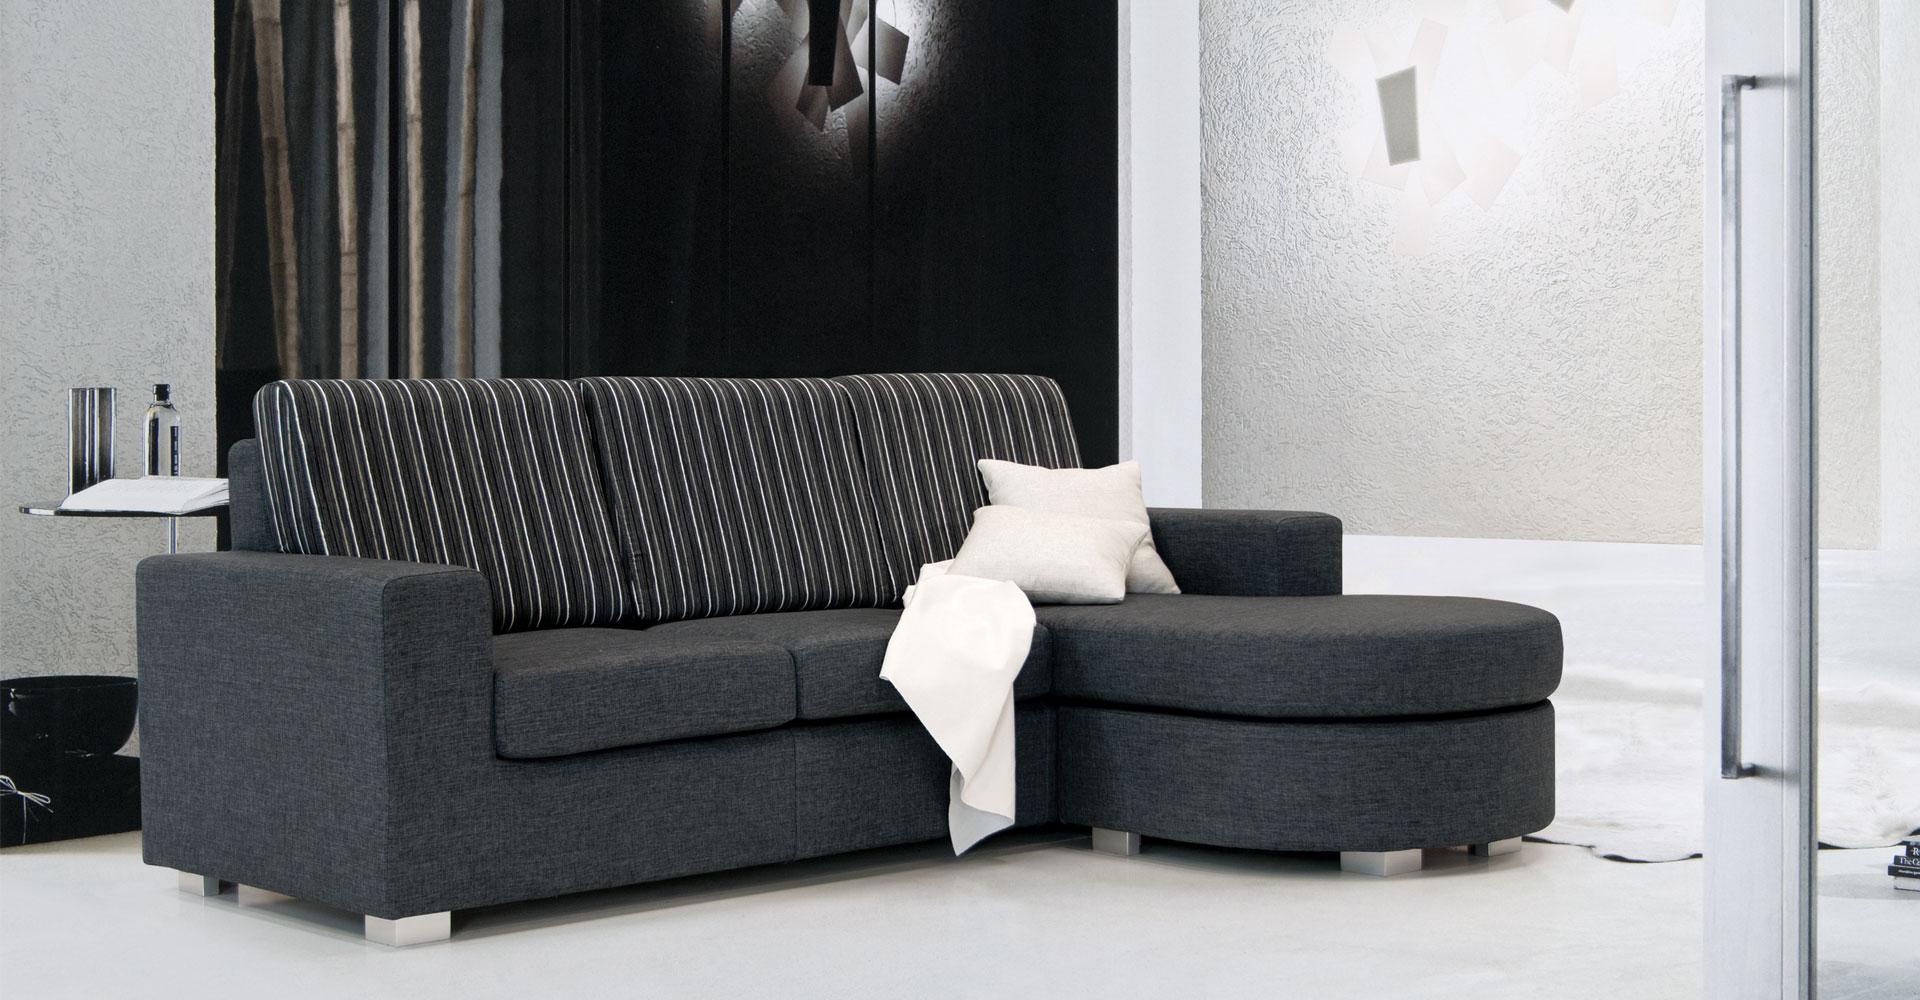 Divani usati great divani usati genova images divani for Divani usati milano